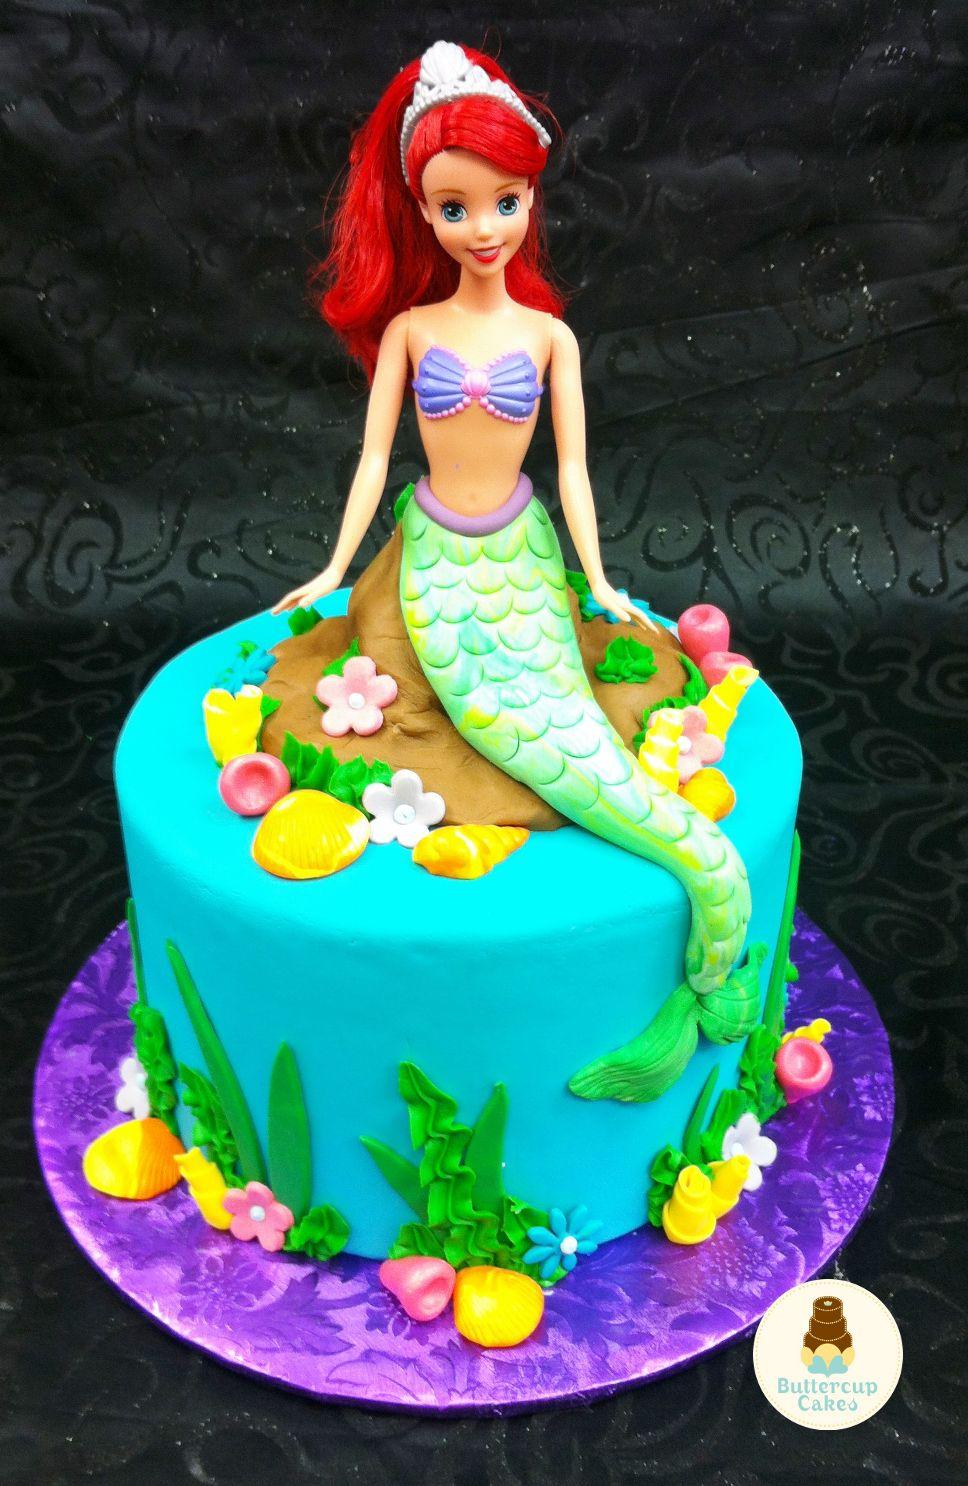 Little Mermaid Birthday Cake Cartoon & Character Cakes